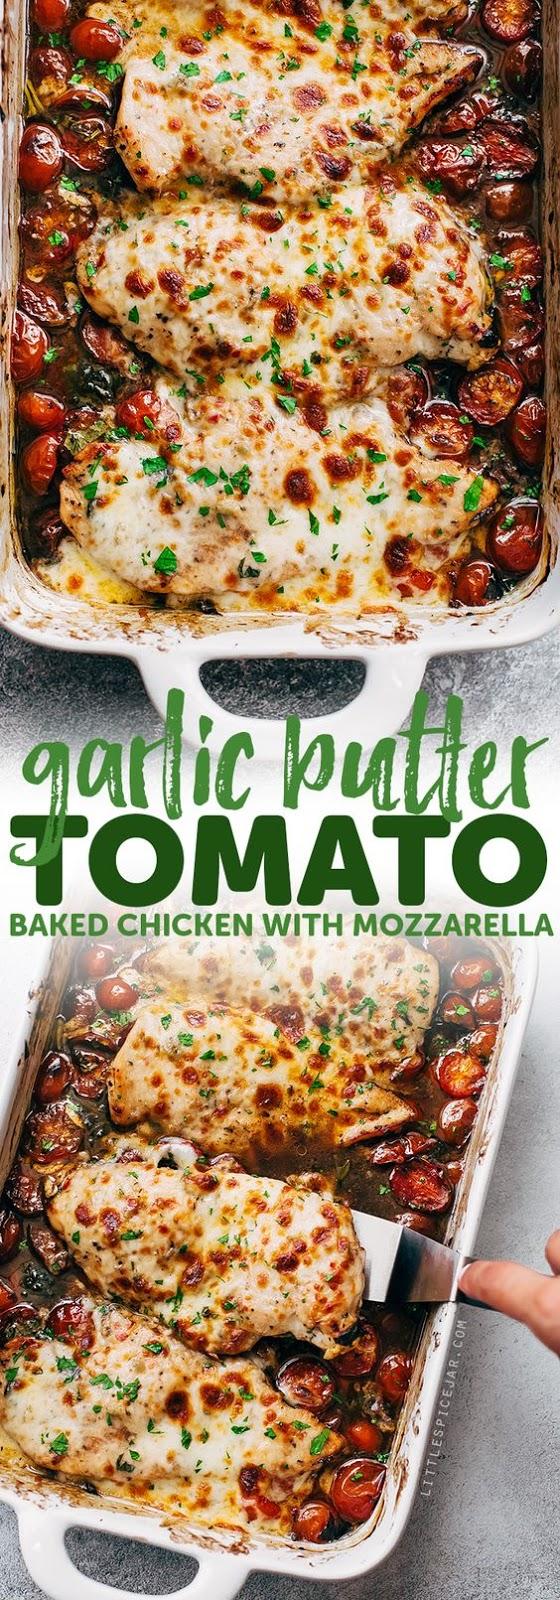 Garlic Butter Tomato Baked Chicken With Mozzarella